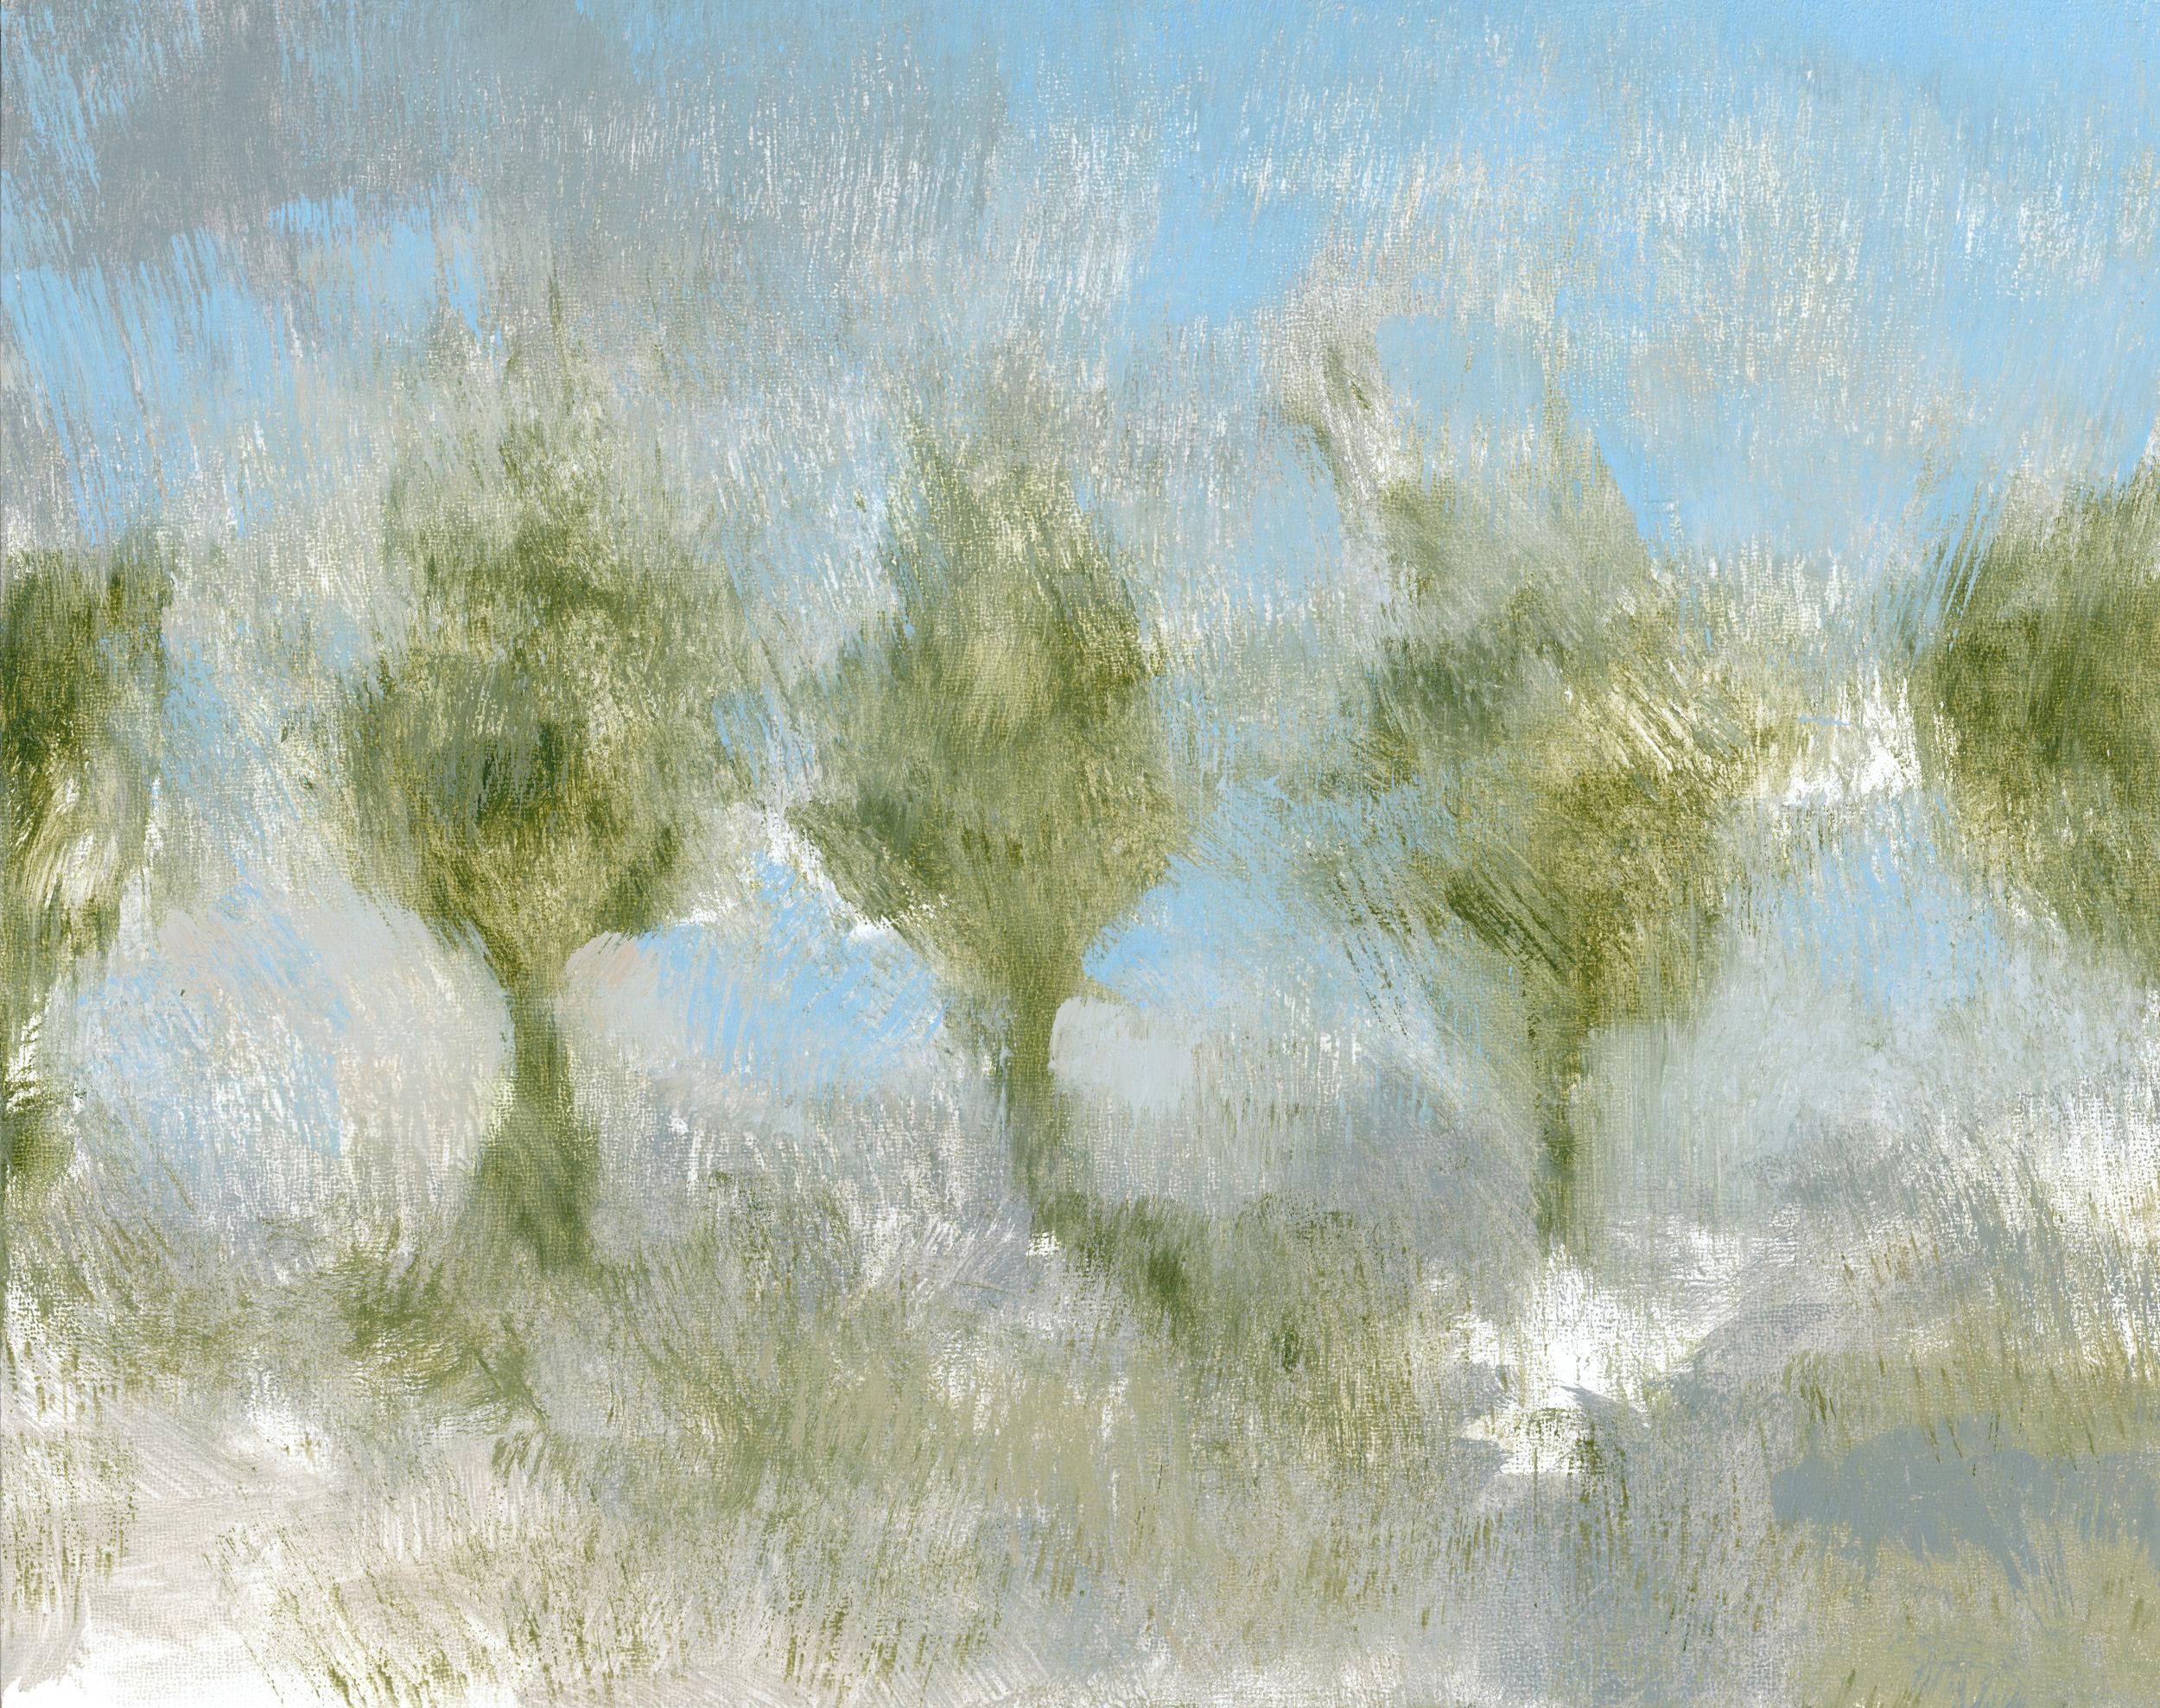 Glenn-Suokko-Landscape-909.jpg